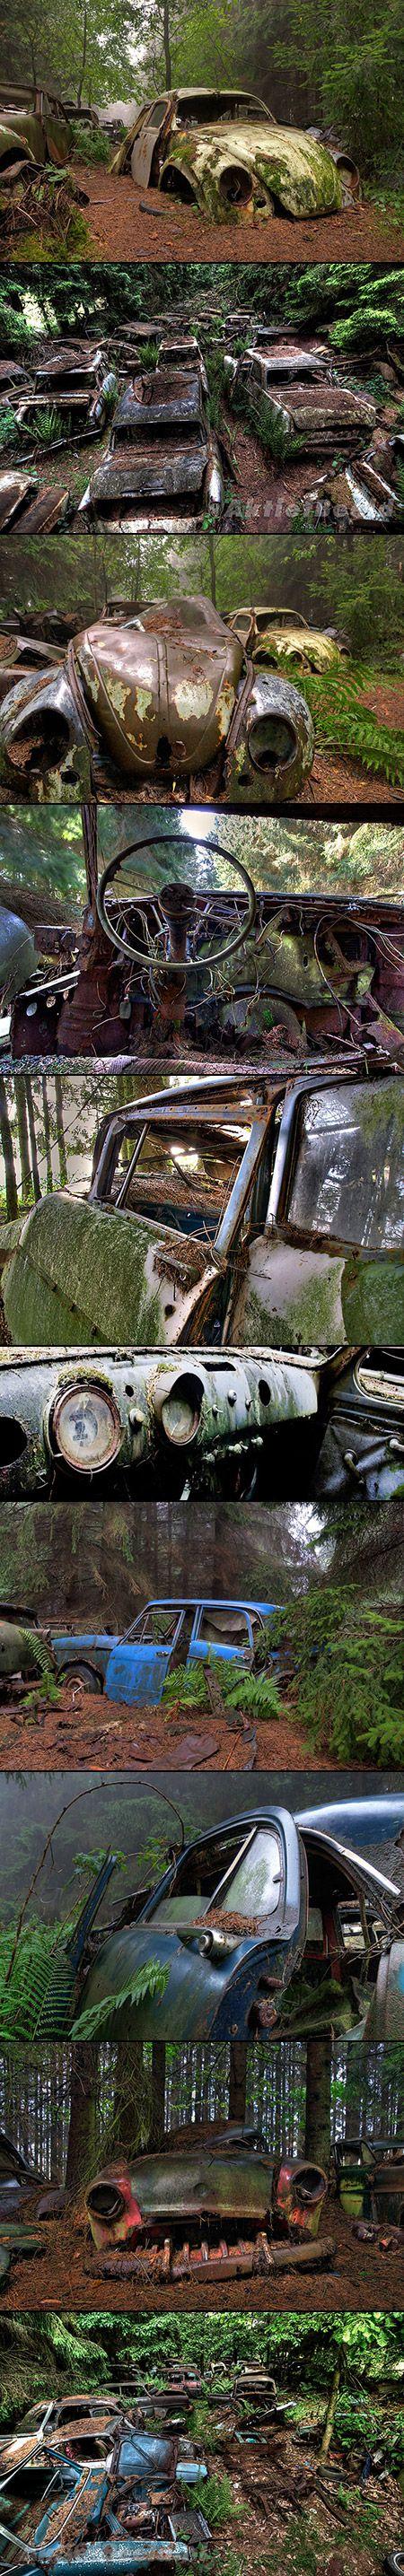 Chatillion Car Graveyard, Belgium @49.6081992,5.7136257